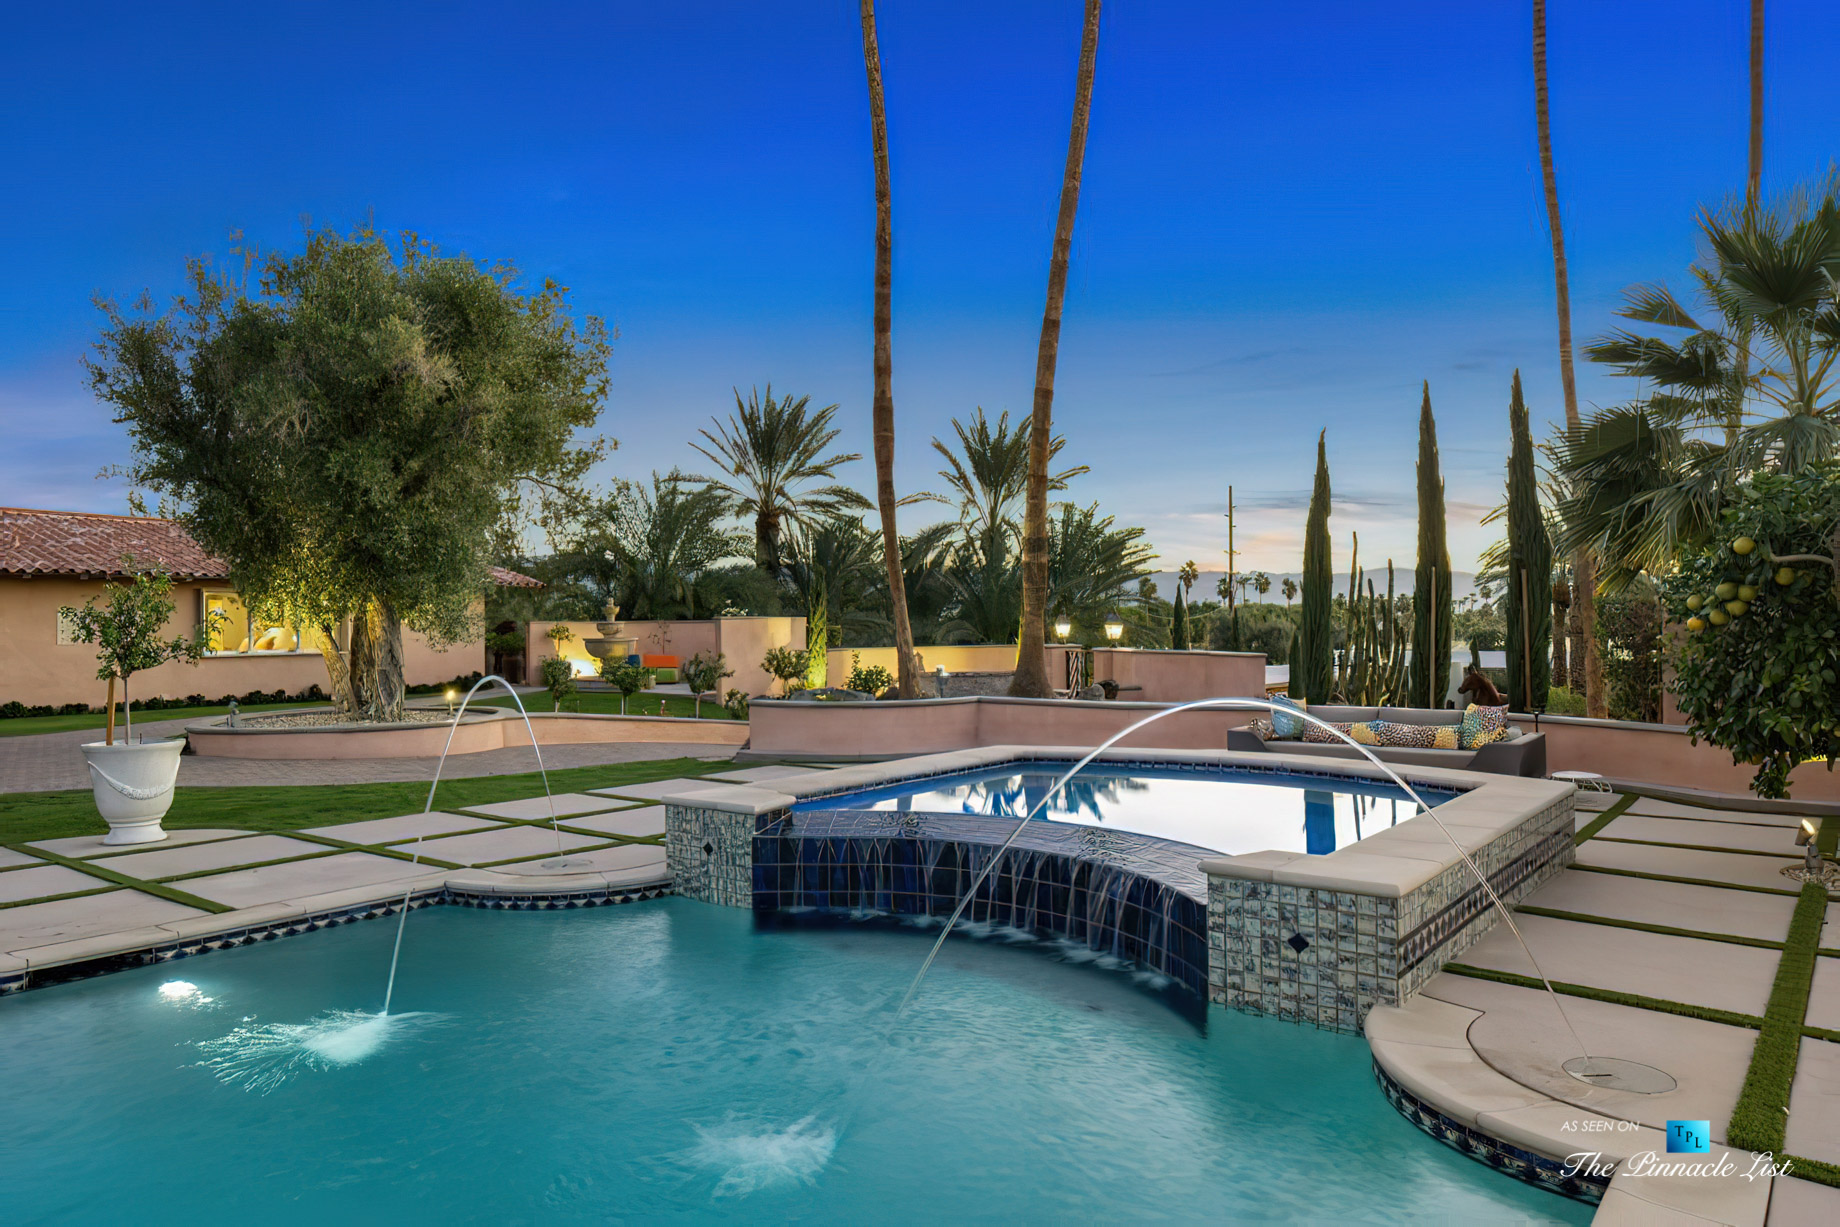 51555 Madison St, La Quinta, CA, USA – Luxury Real Estate